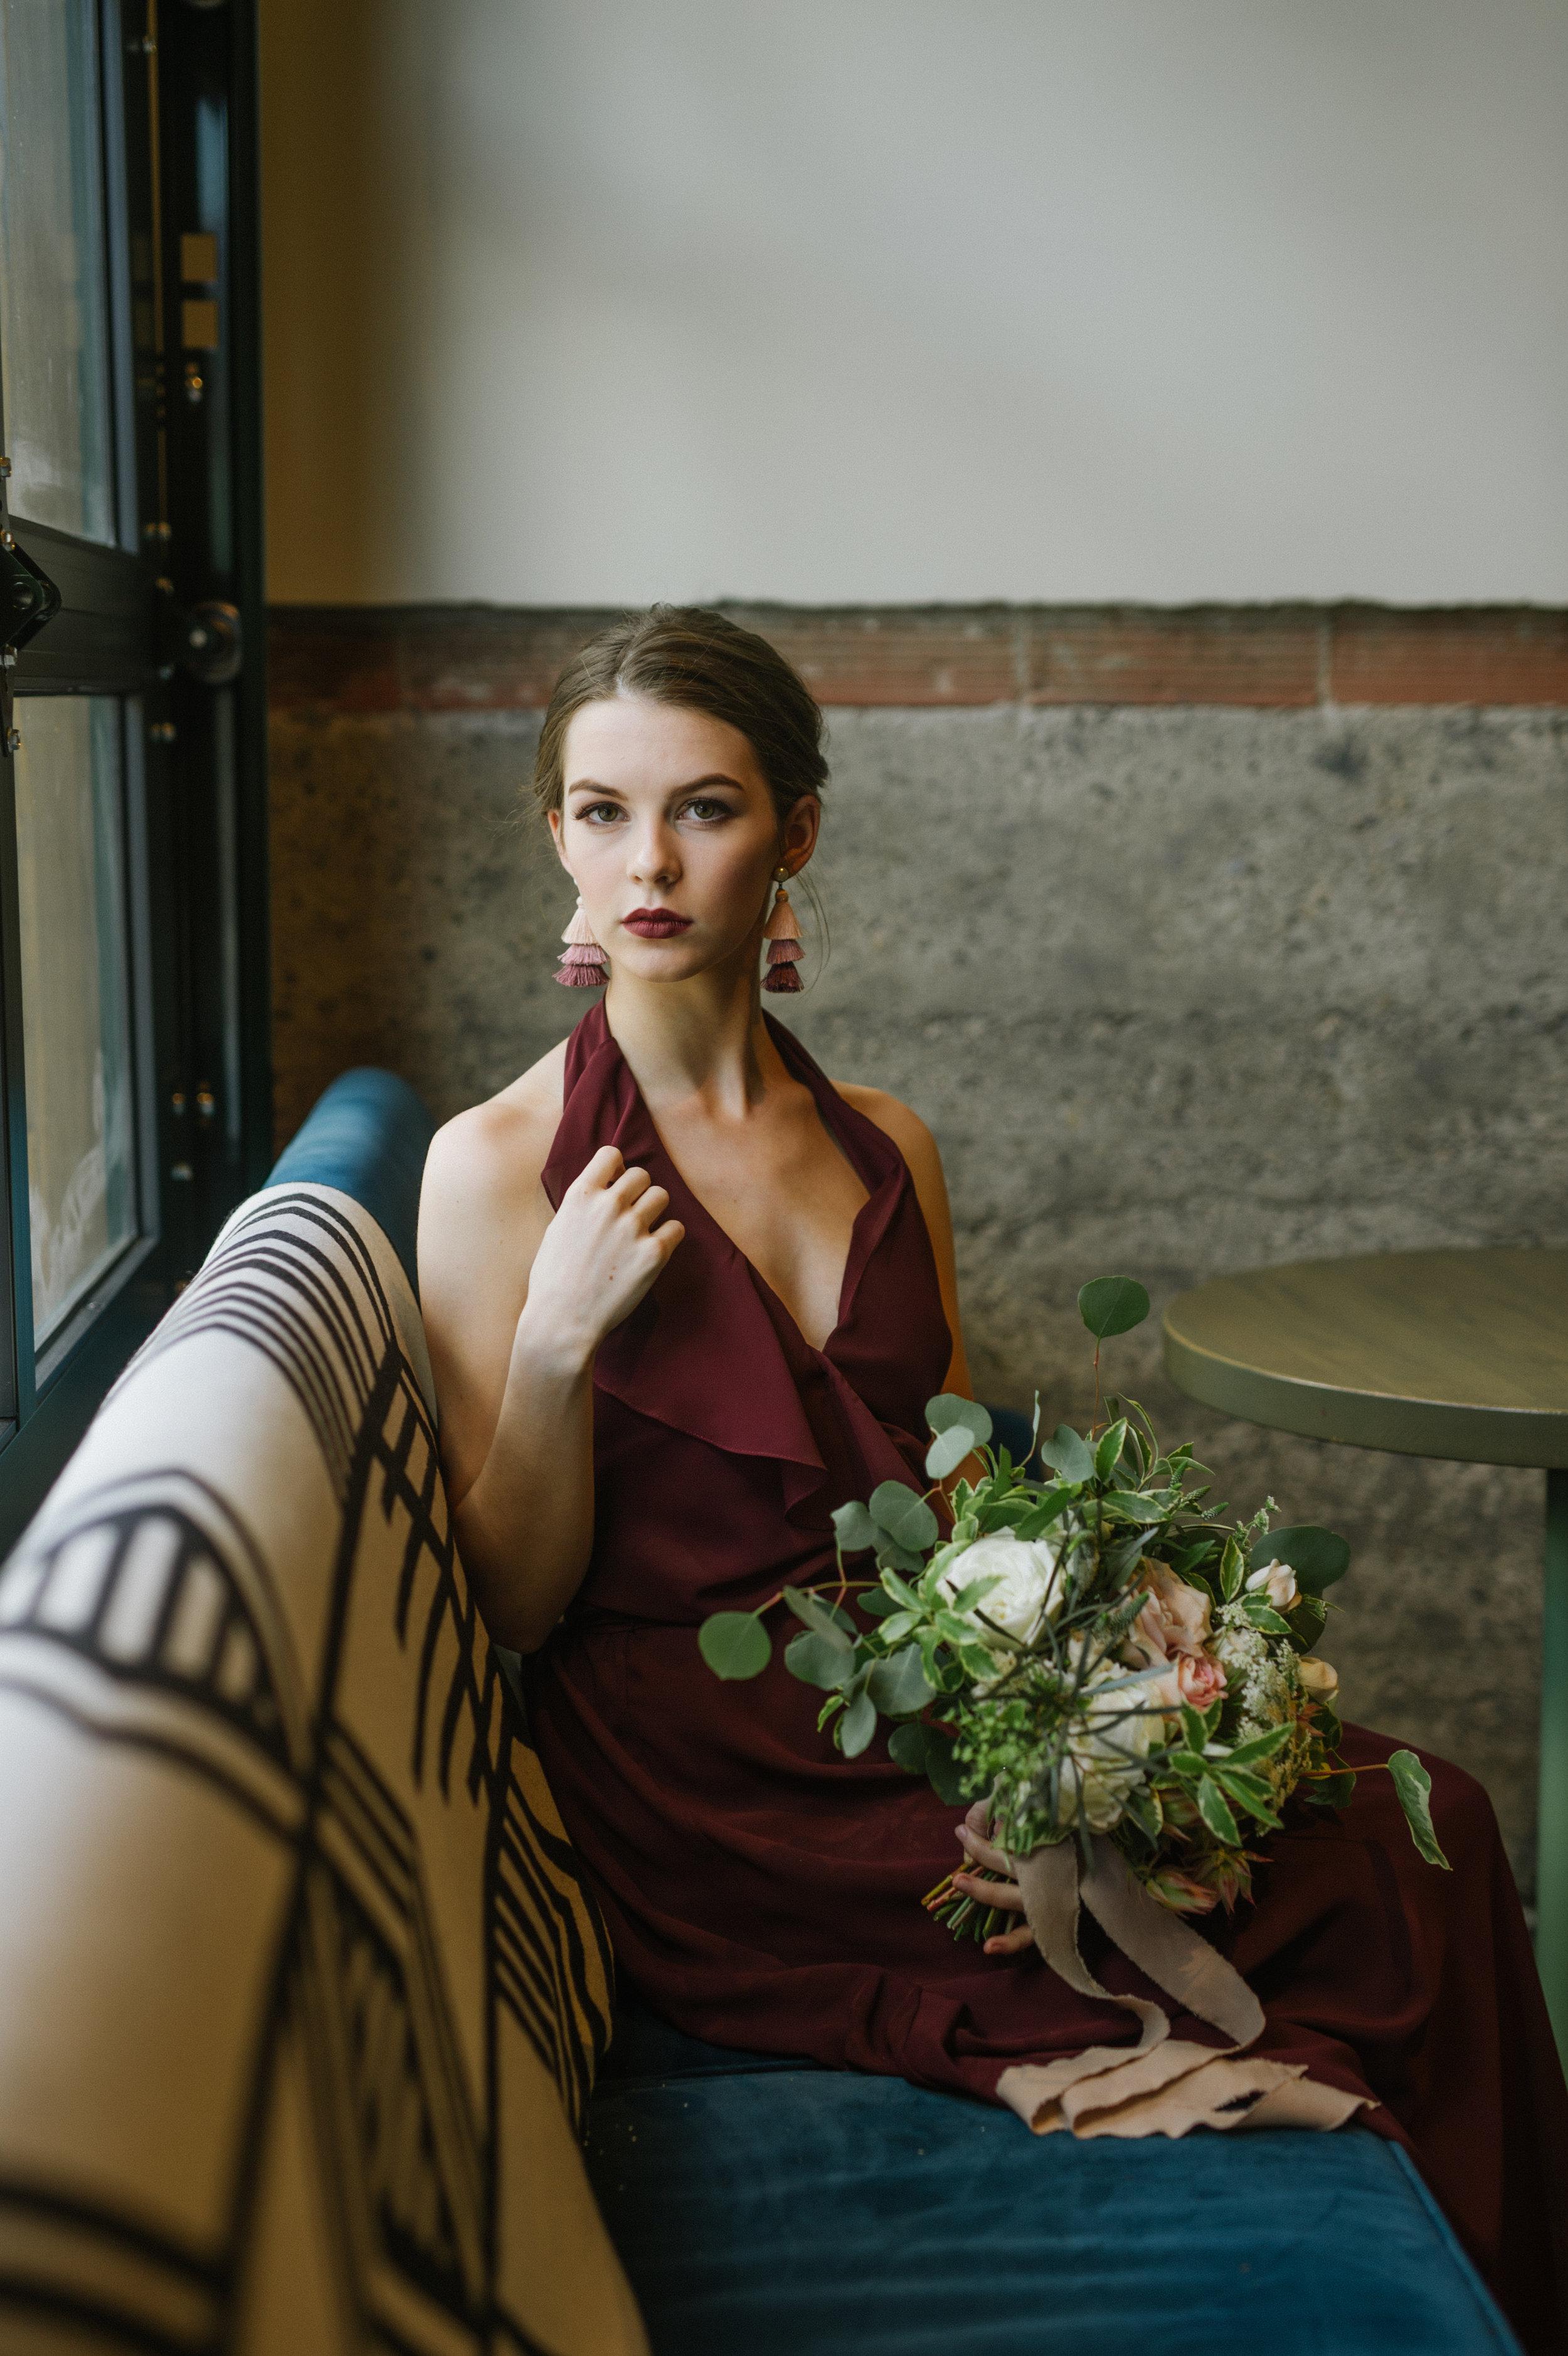 Calgary_Wedding_Photography_Bridgette_Bar_Bridesmaids_Shoot_2018_HR078.jpg